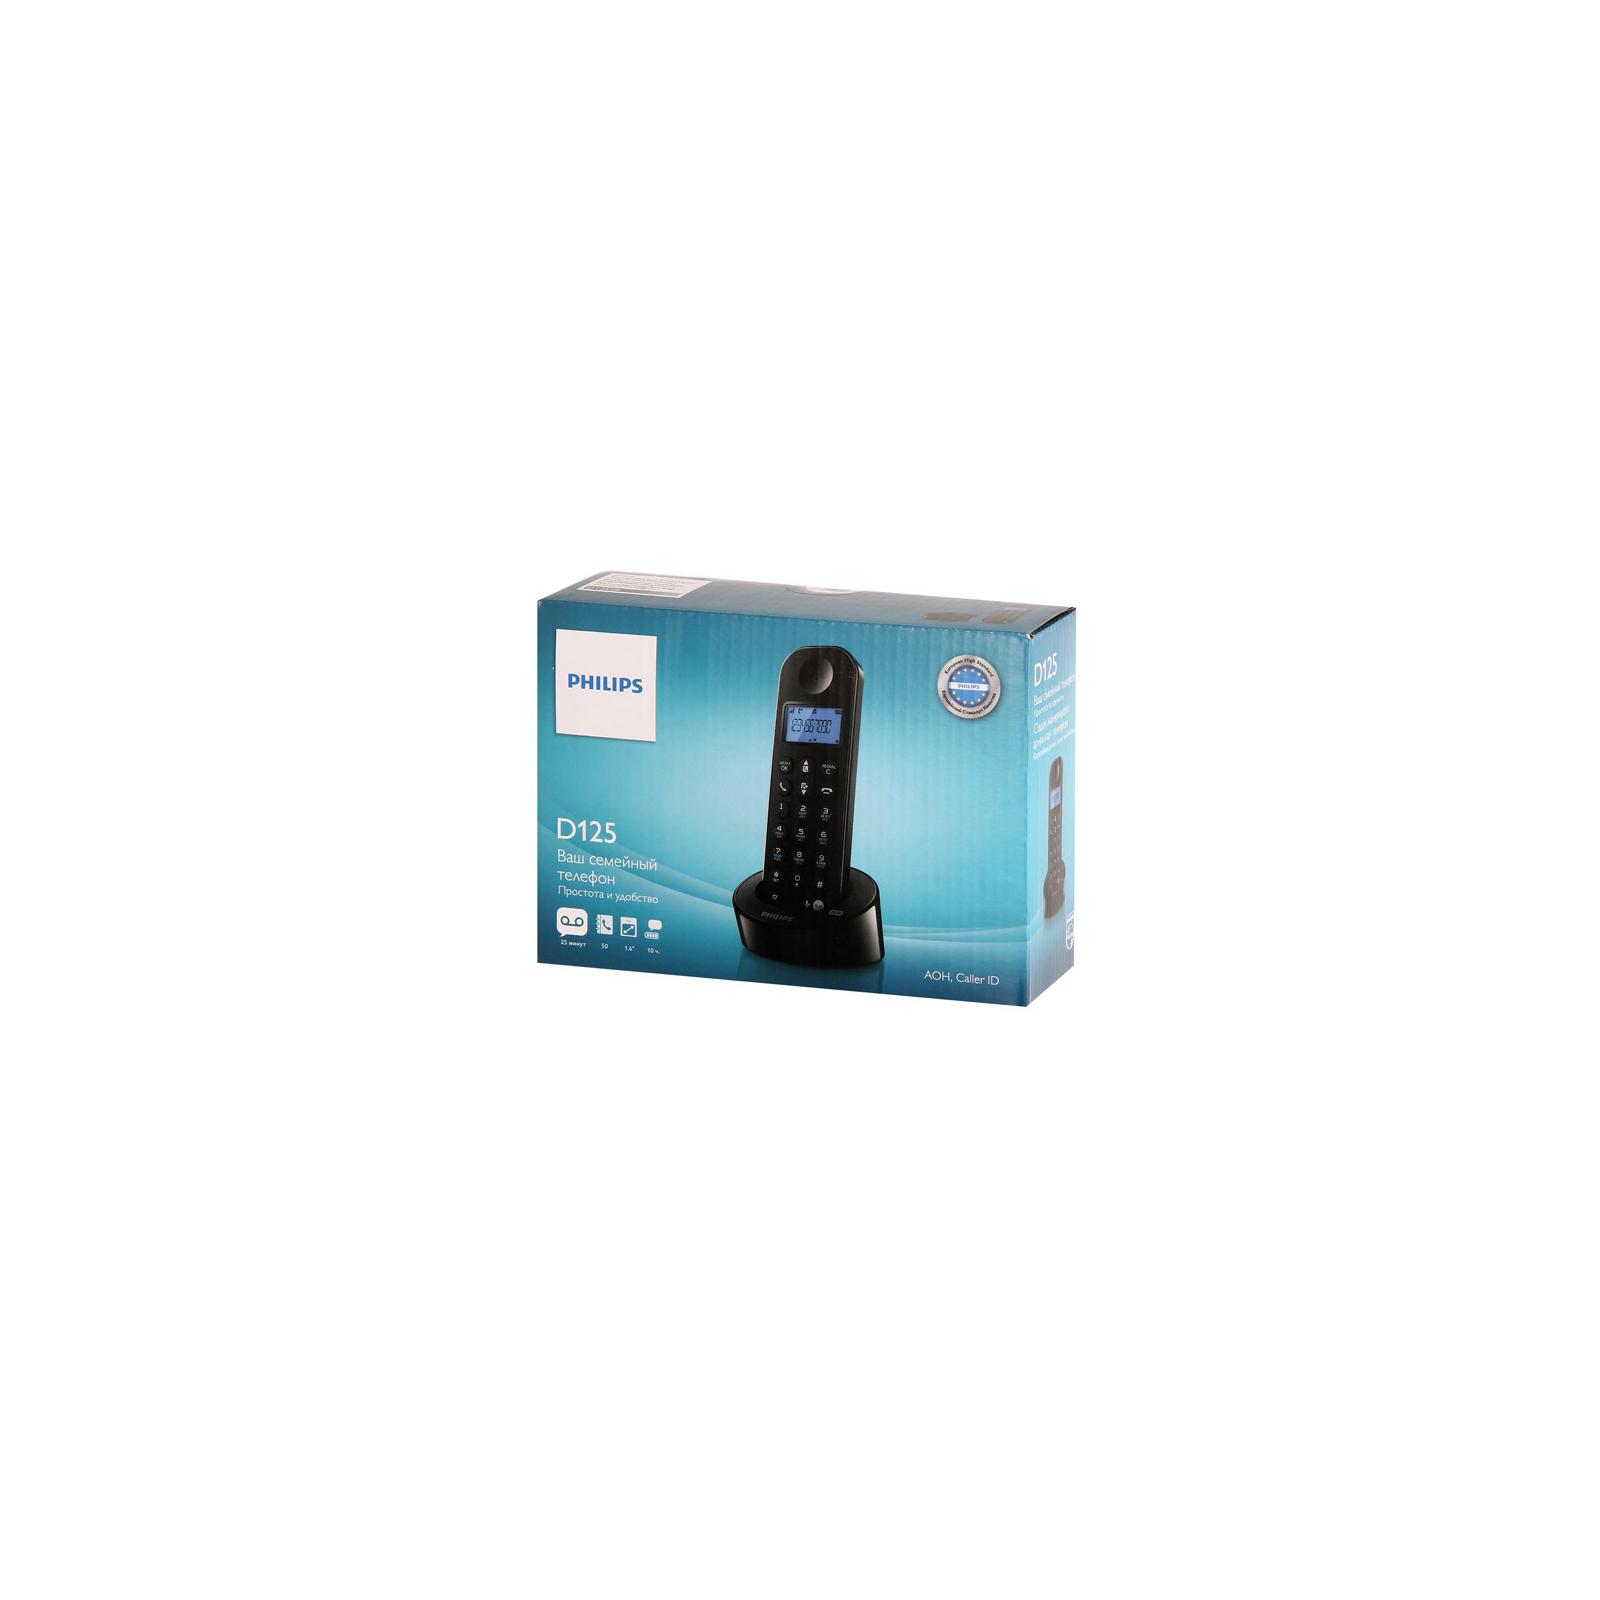 Телефон DECT PHILIPS D1251B/51 изображение 4